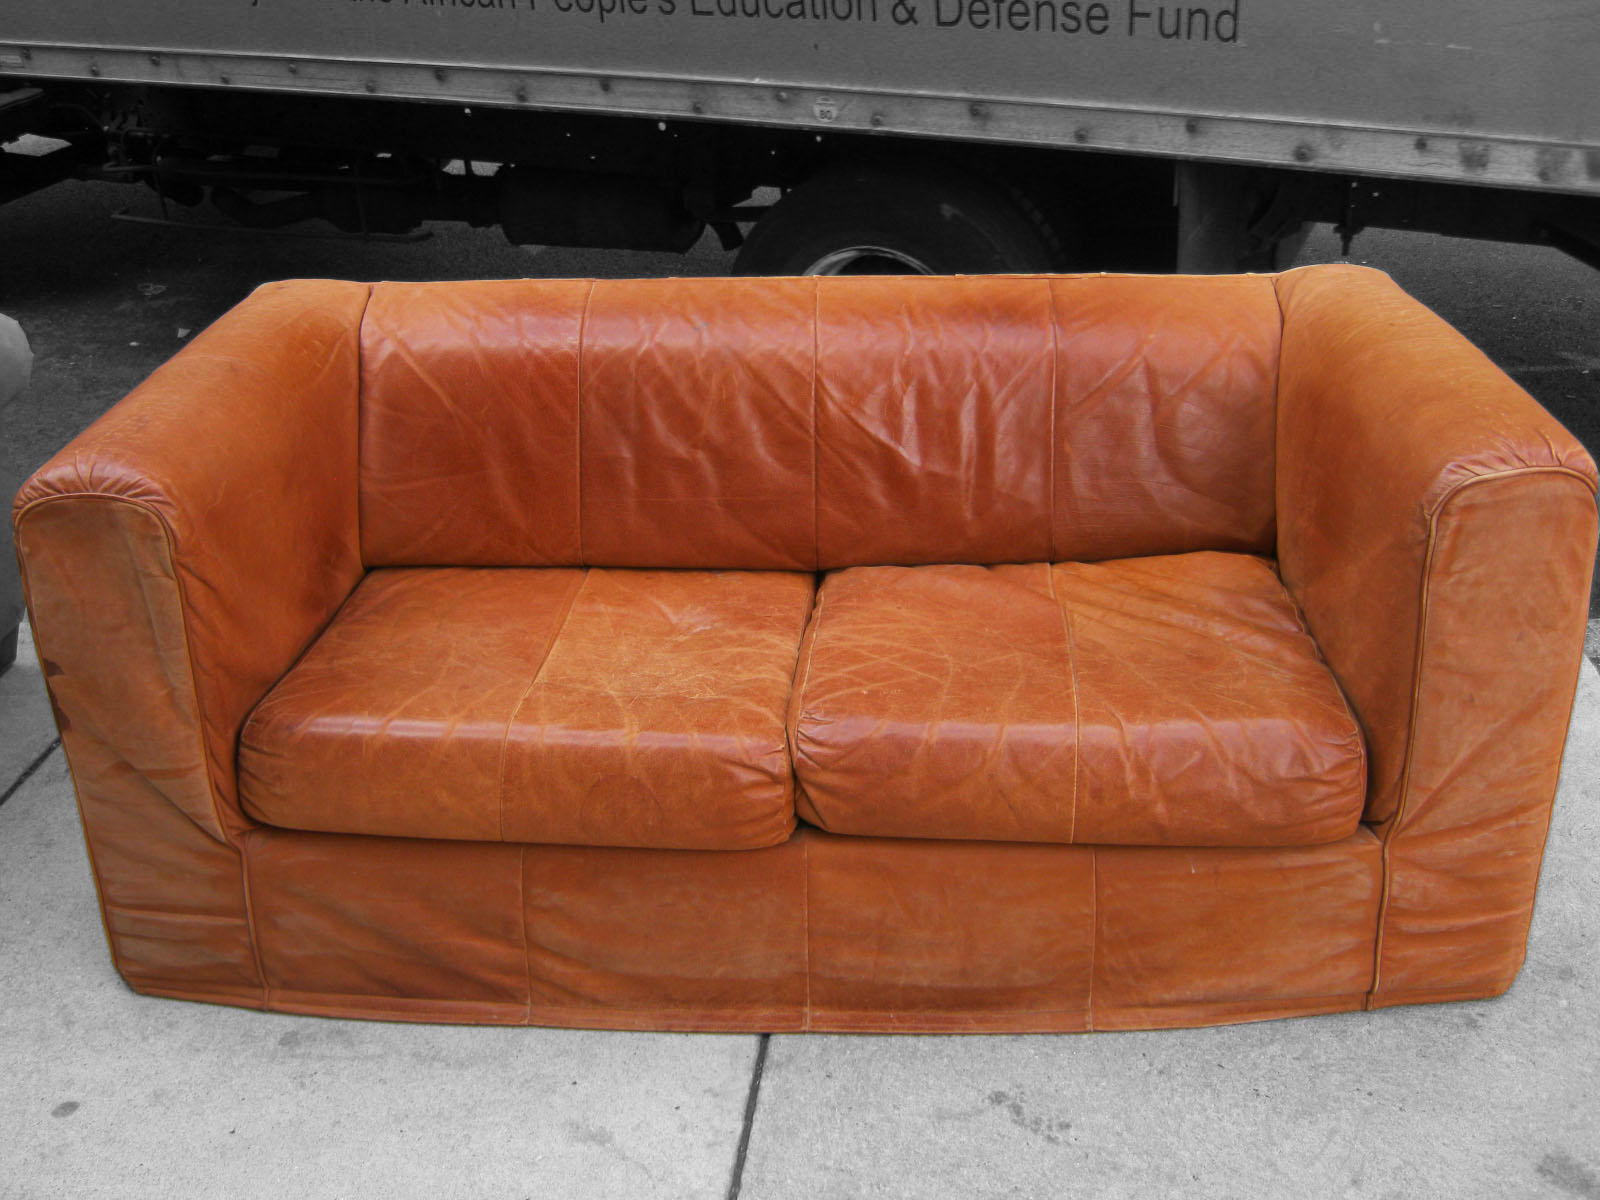 Astonishing Uhuru Furniture Collectibles Camel Colored Leather Sofa Creativecarmelina Interior Chair Design Creativecarmelinacom